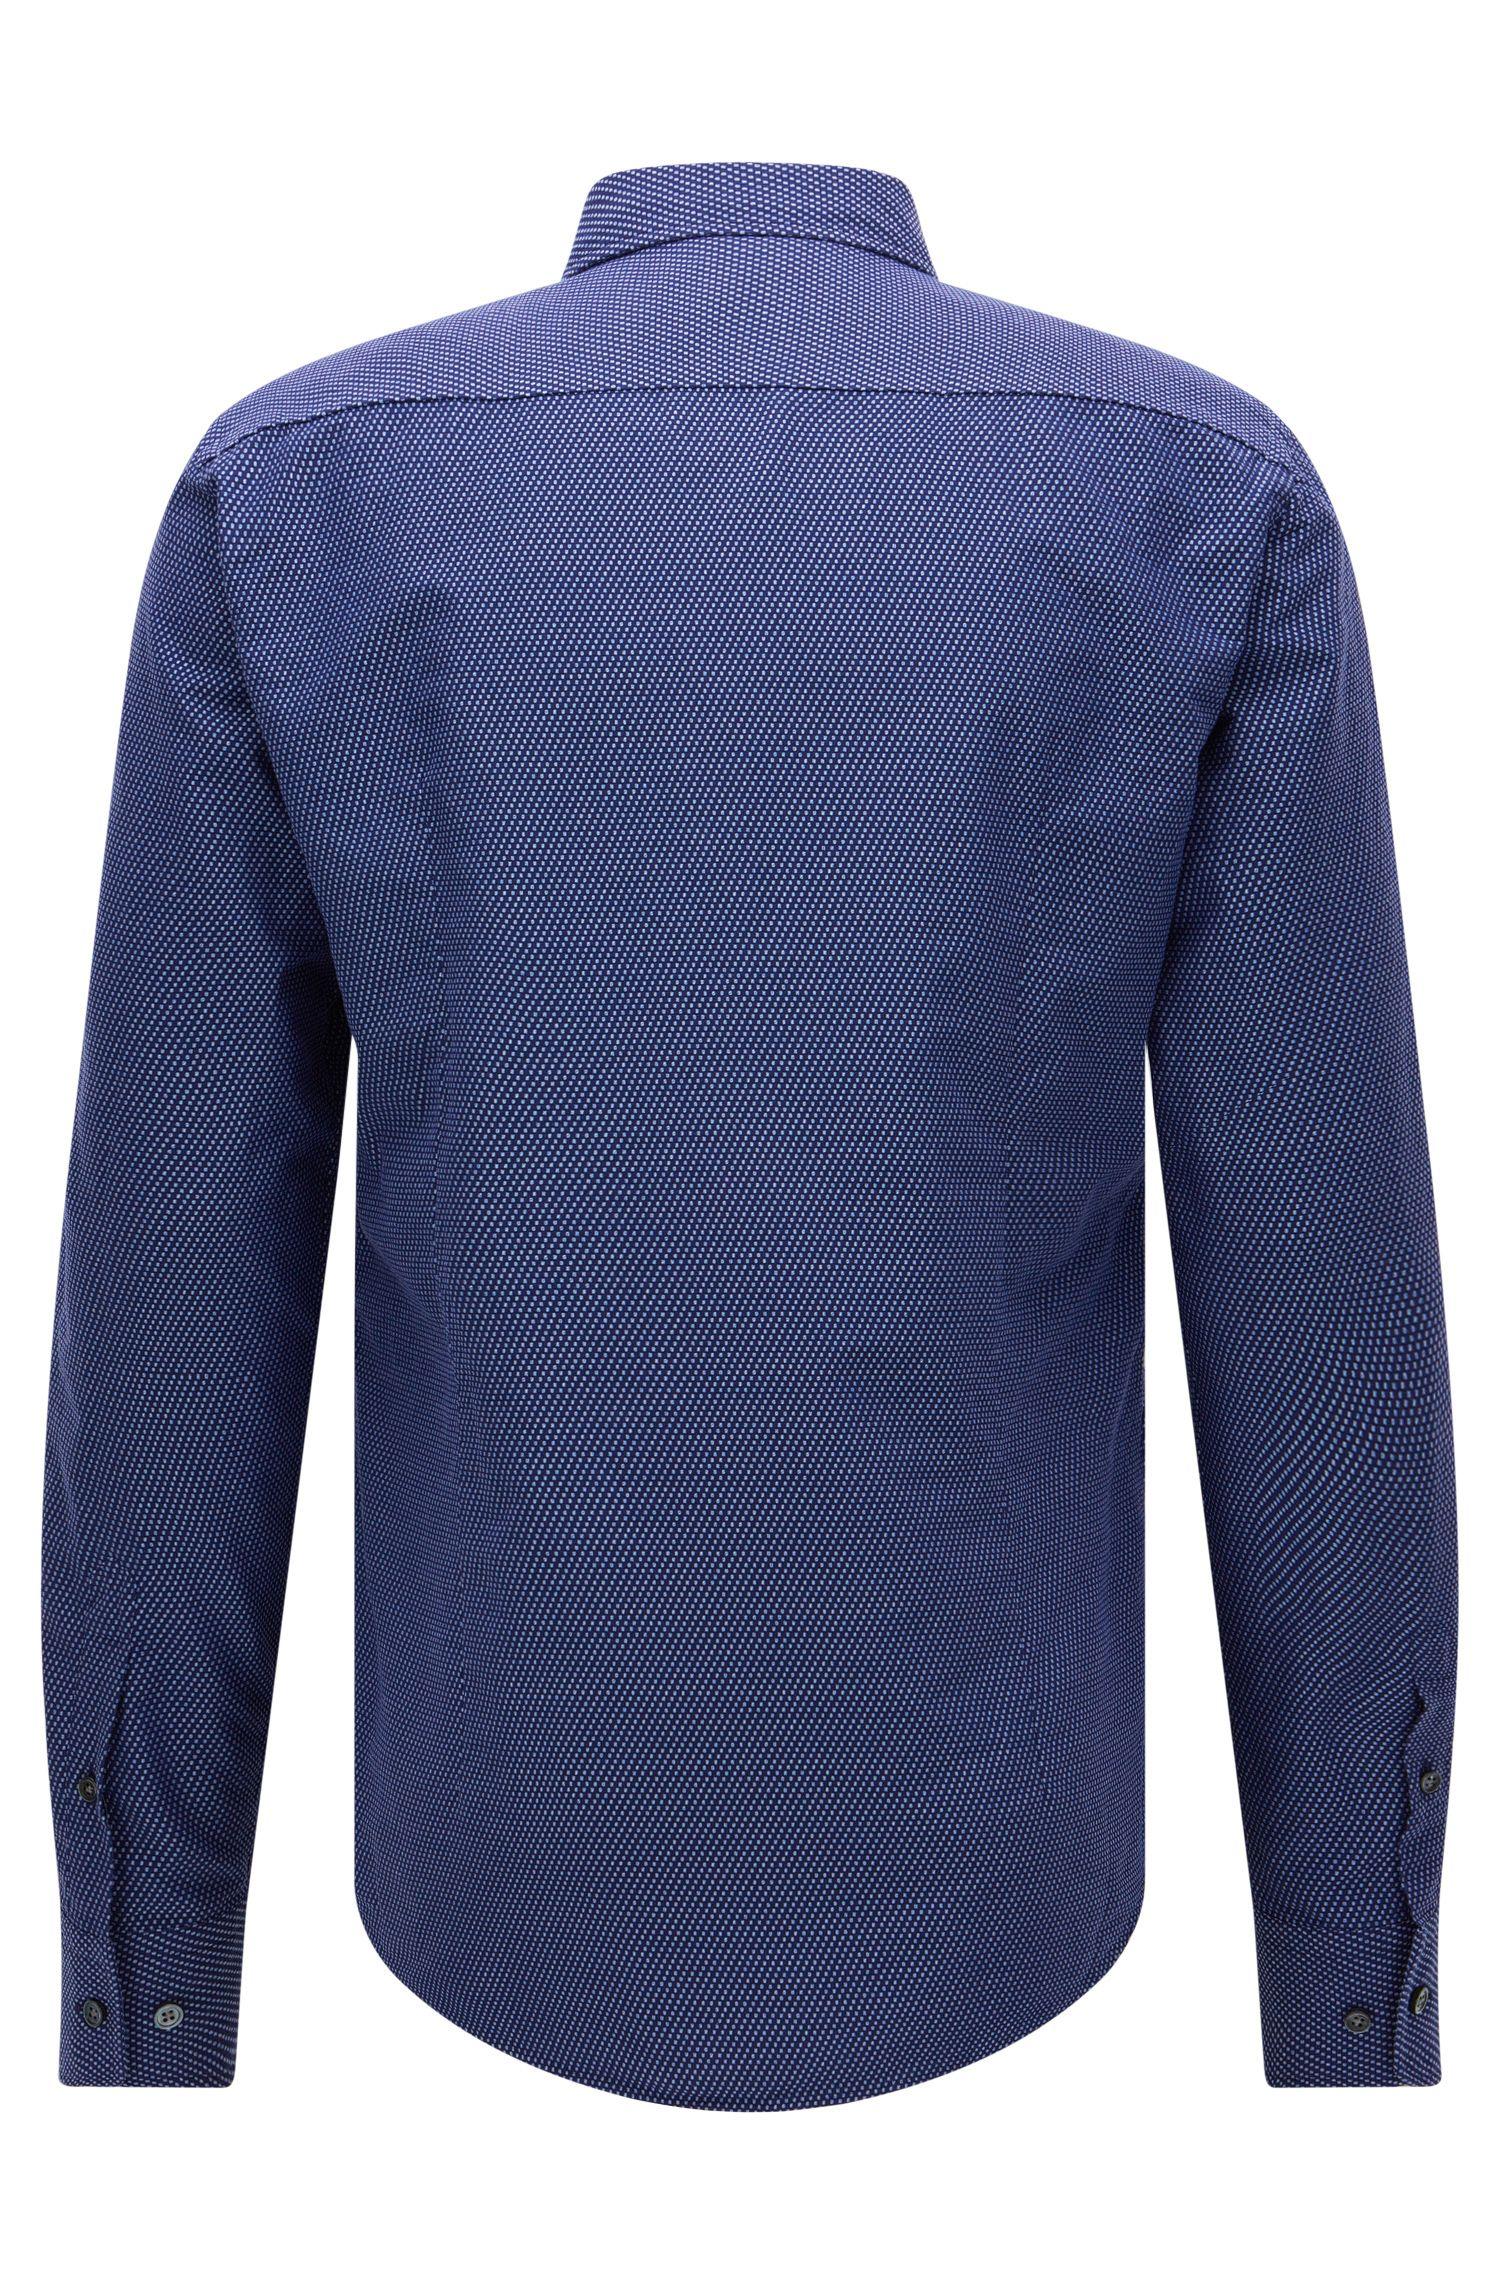 Italian Cotton Button Down Shirt, Slim Fit | T-Riccardo F